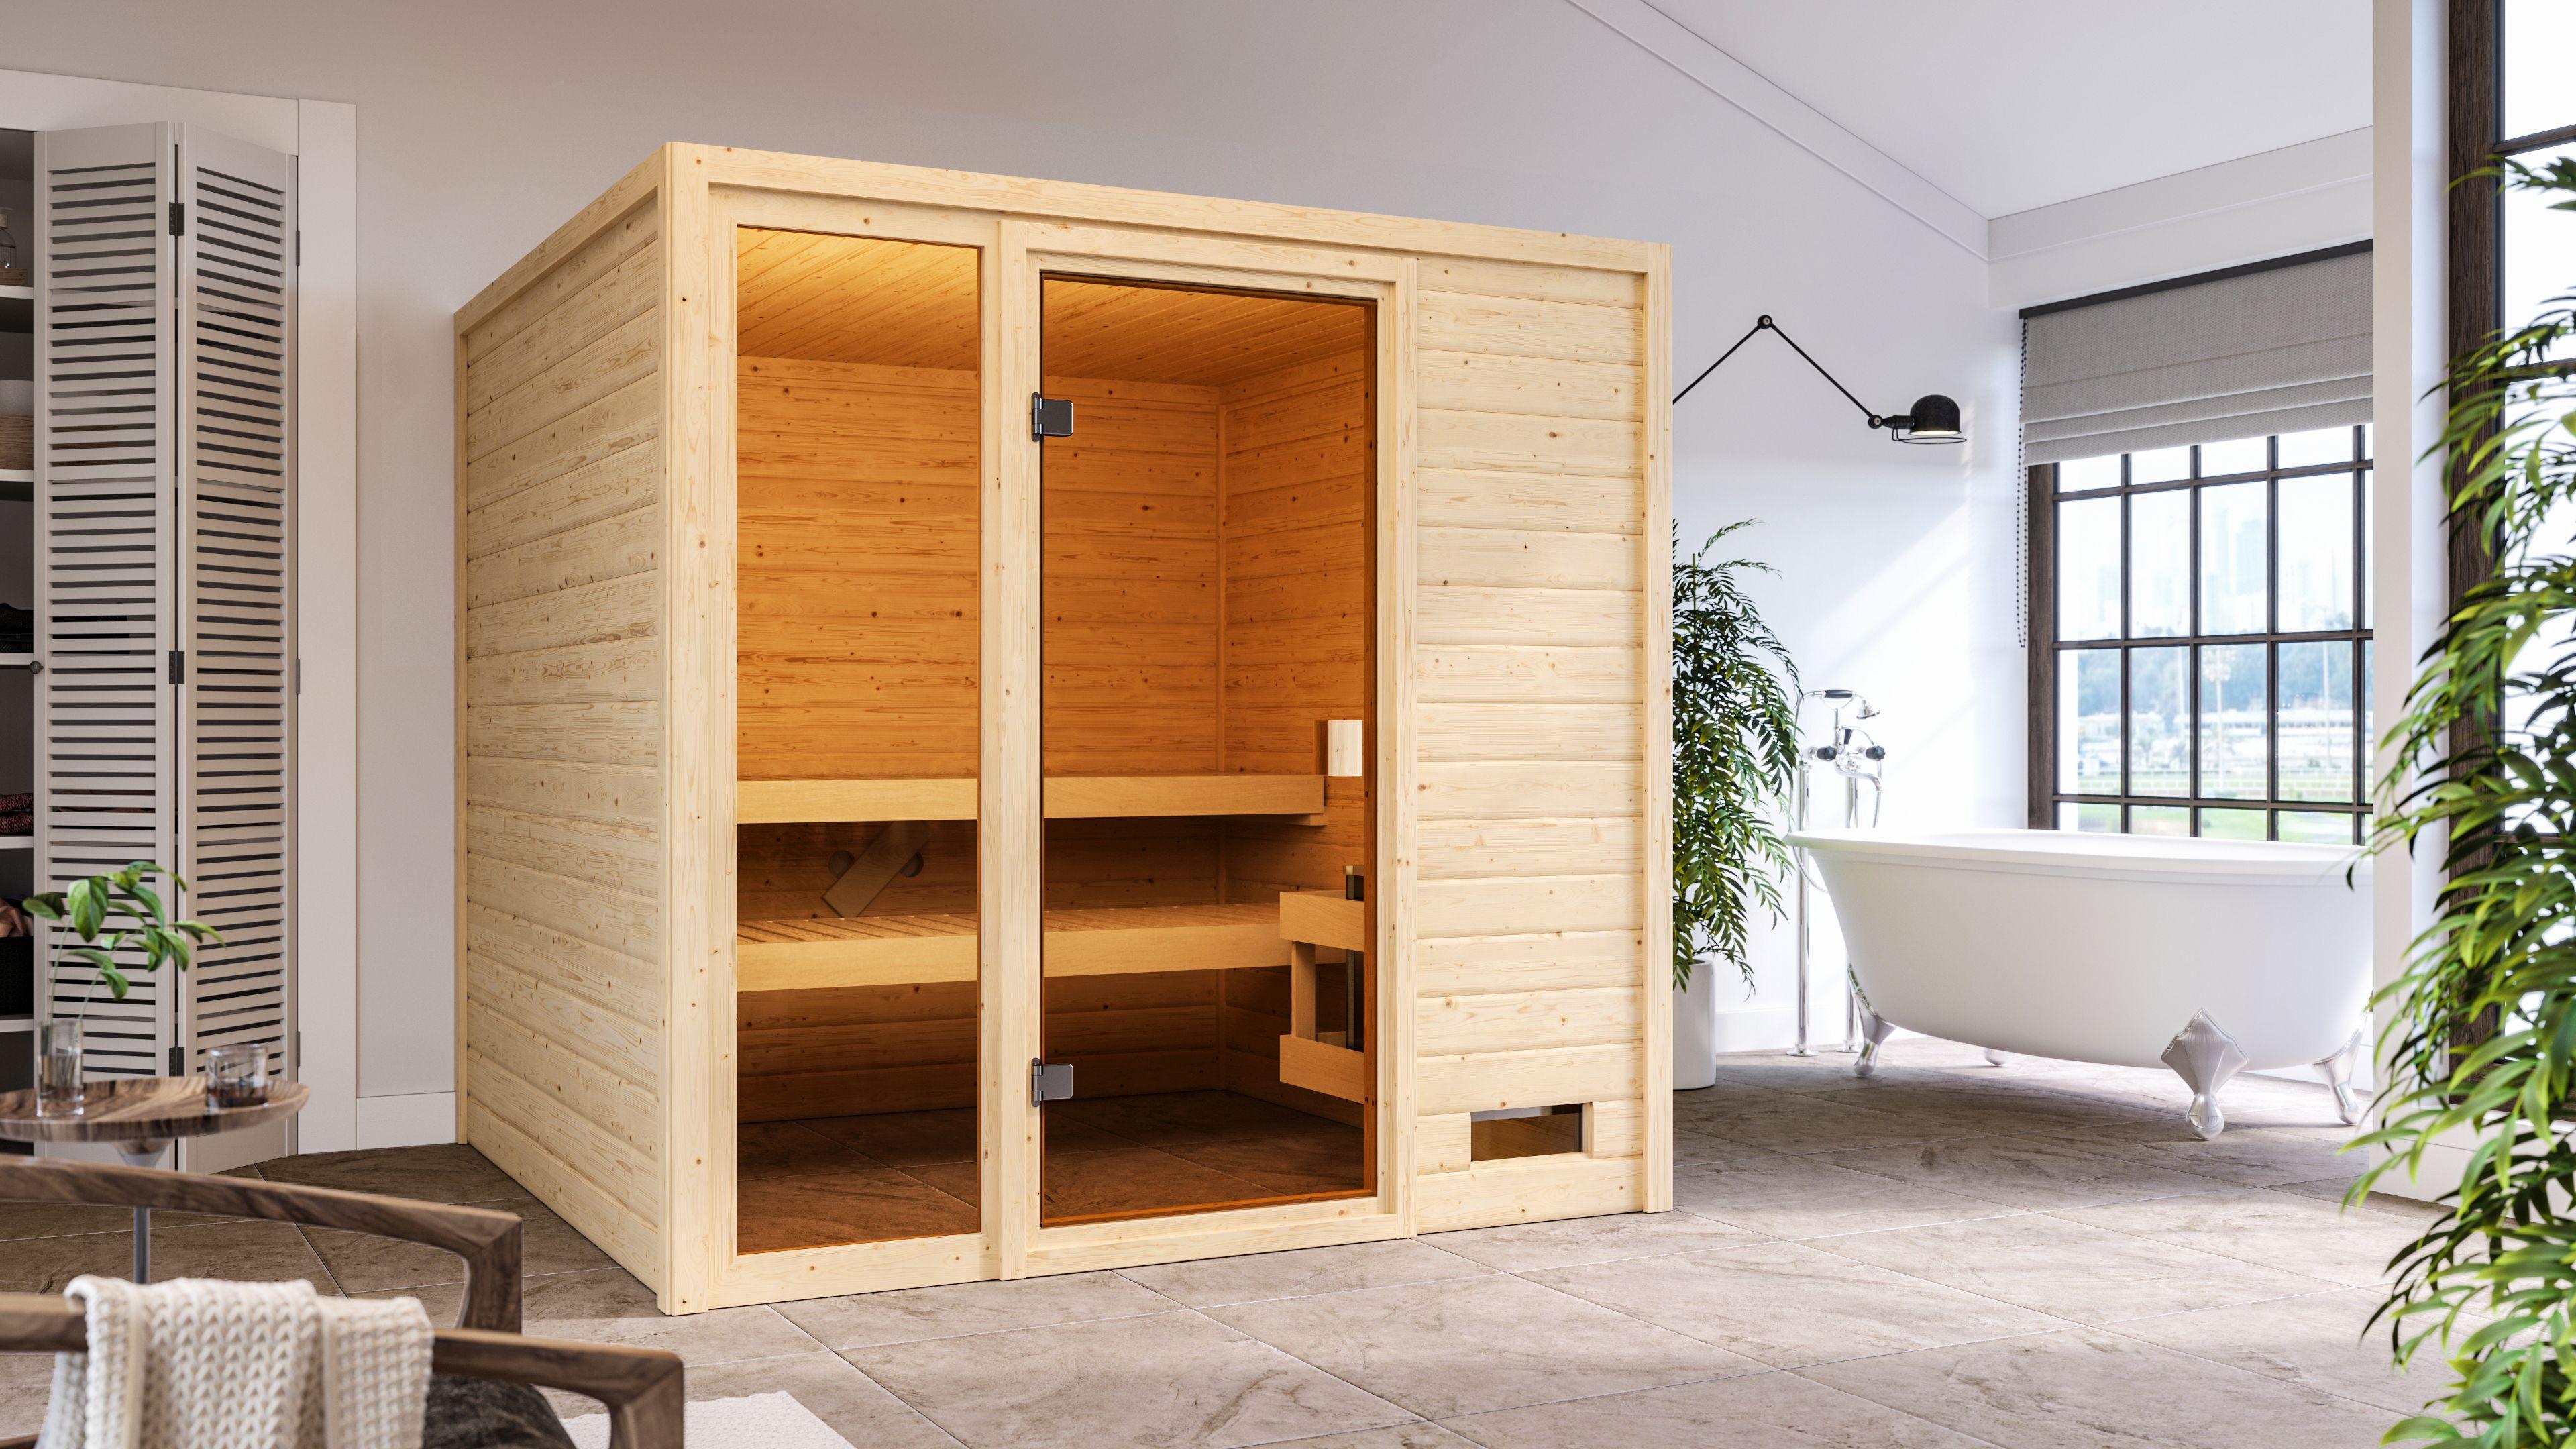 Woodfeeling Sauna Jutta 38mm ohne Saunaofen Bild 2